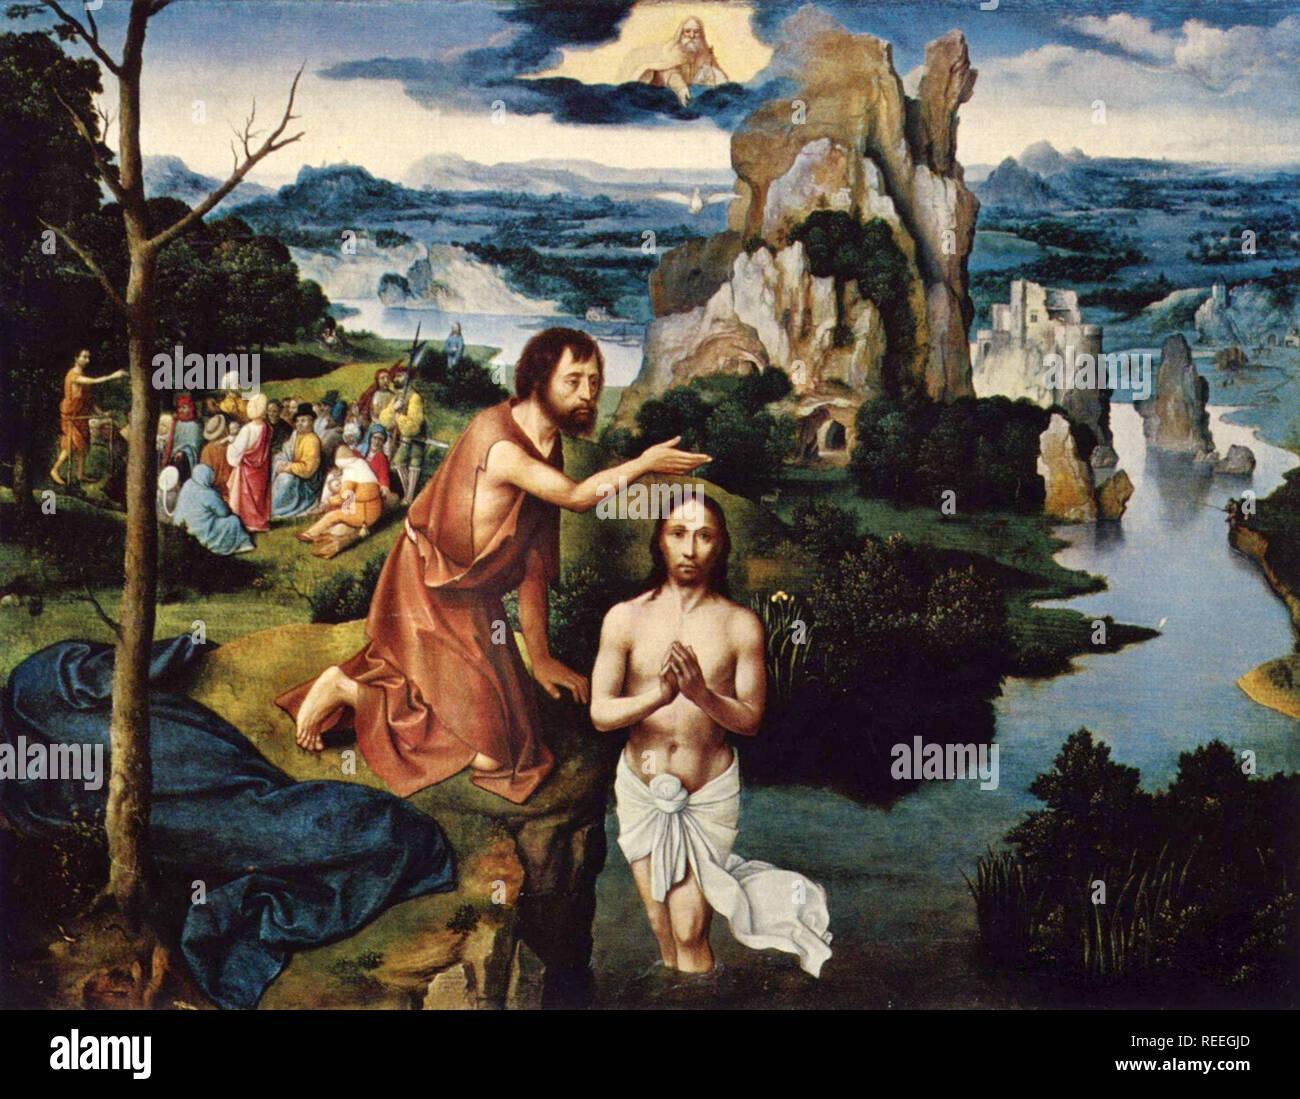 Taufe Christi von Joachim Patinir Stockbild